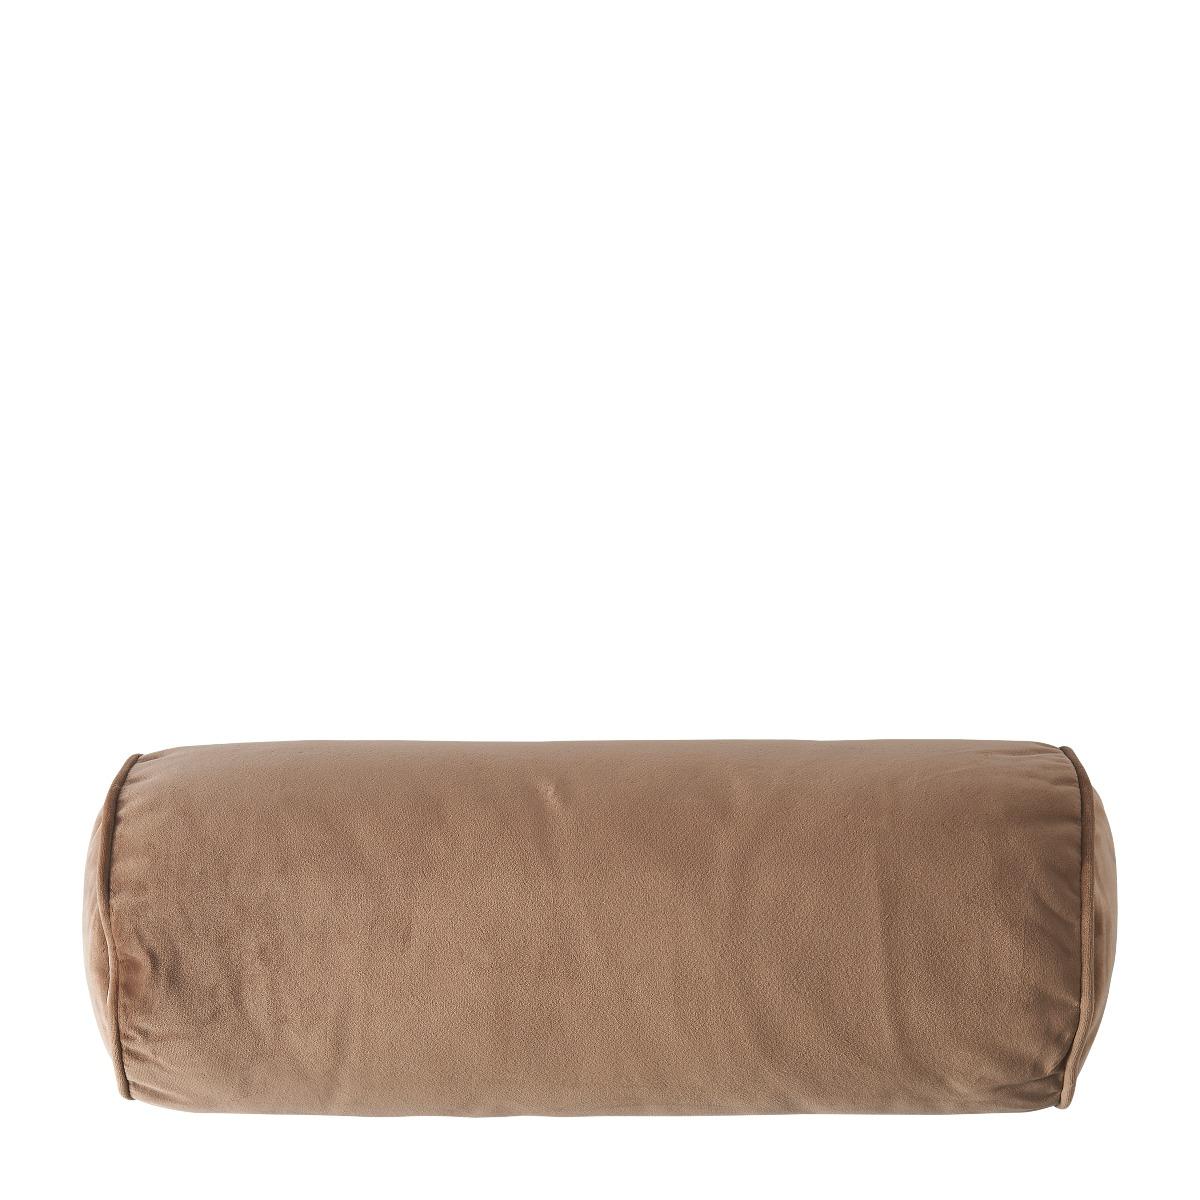 Koc Aspen Faux Fur Throw 170×130 cm Riviera Maison Miloo Home 426670